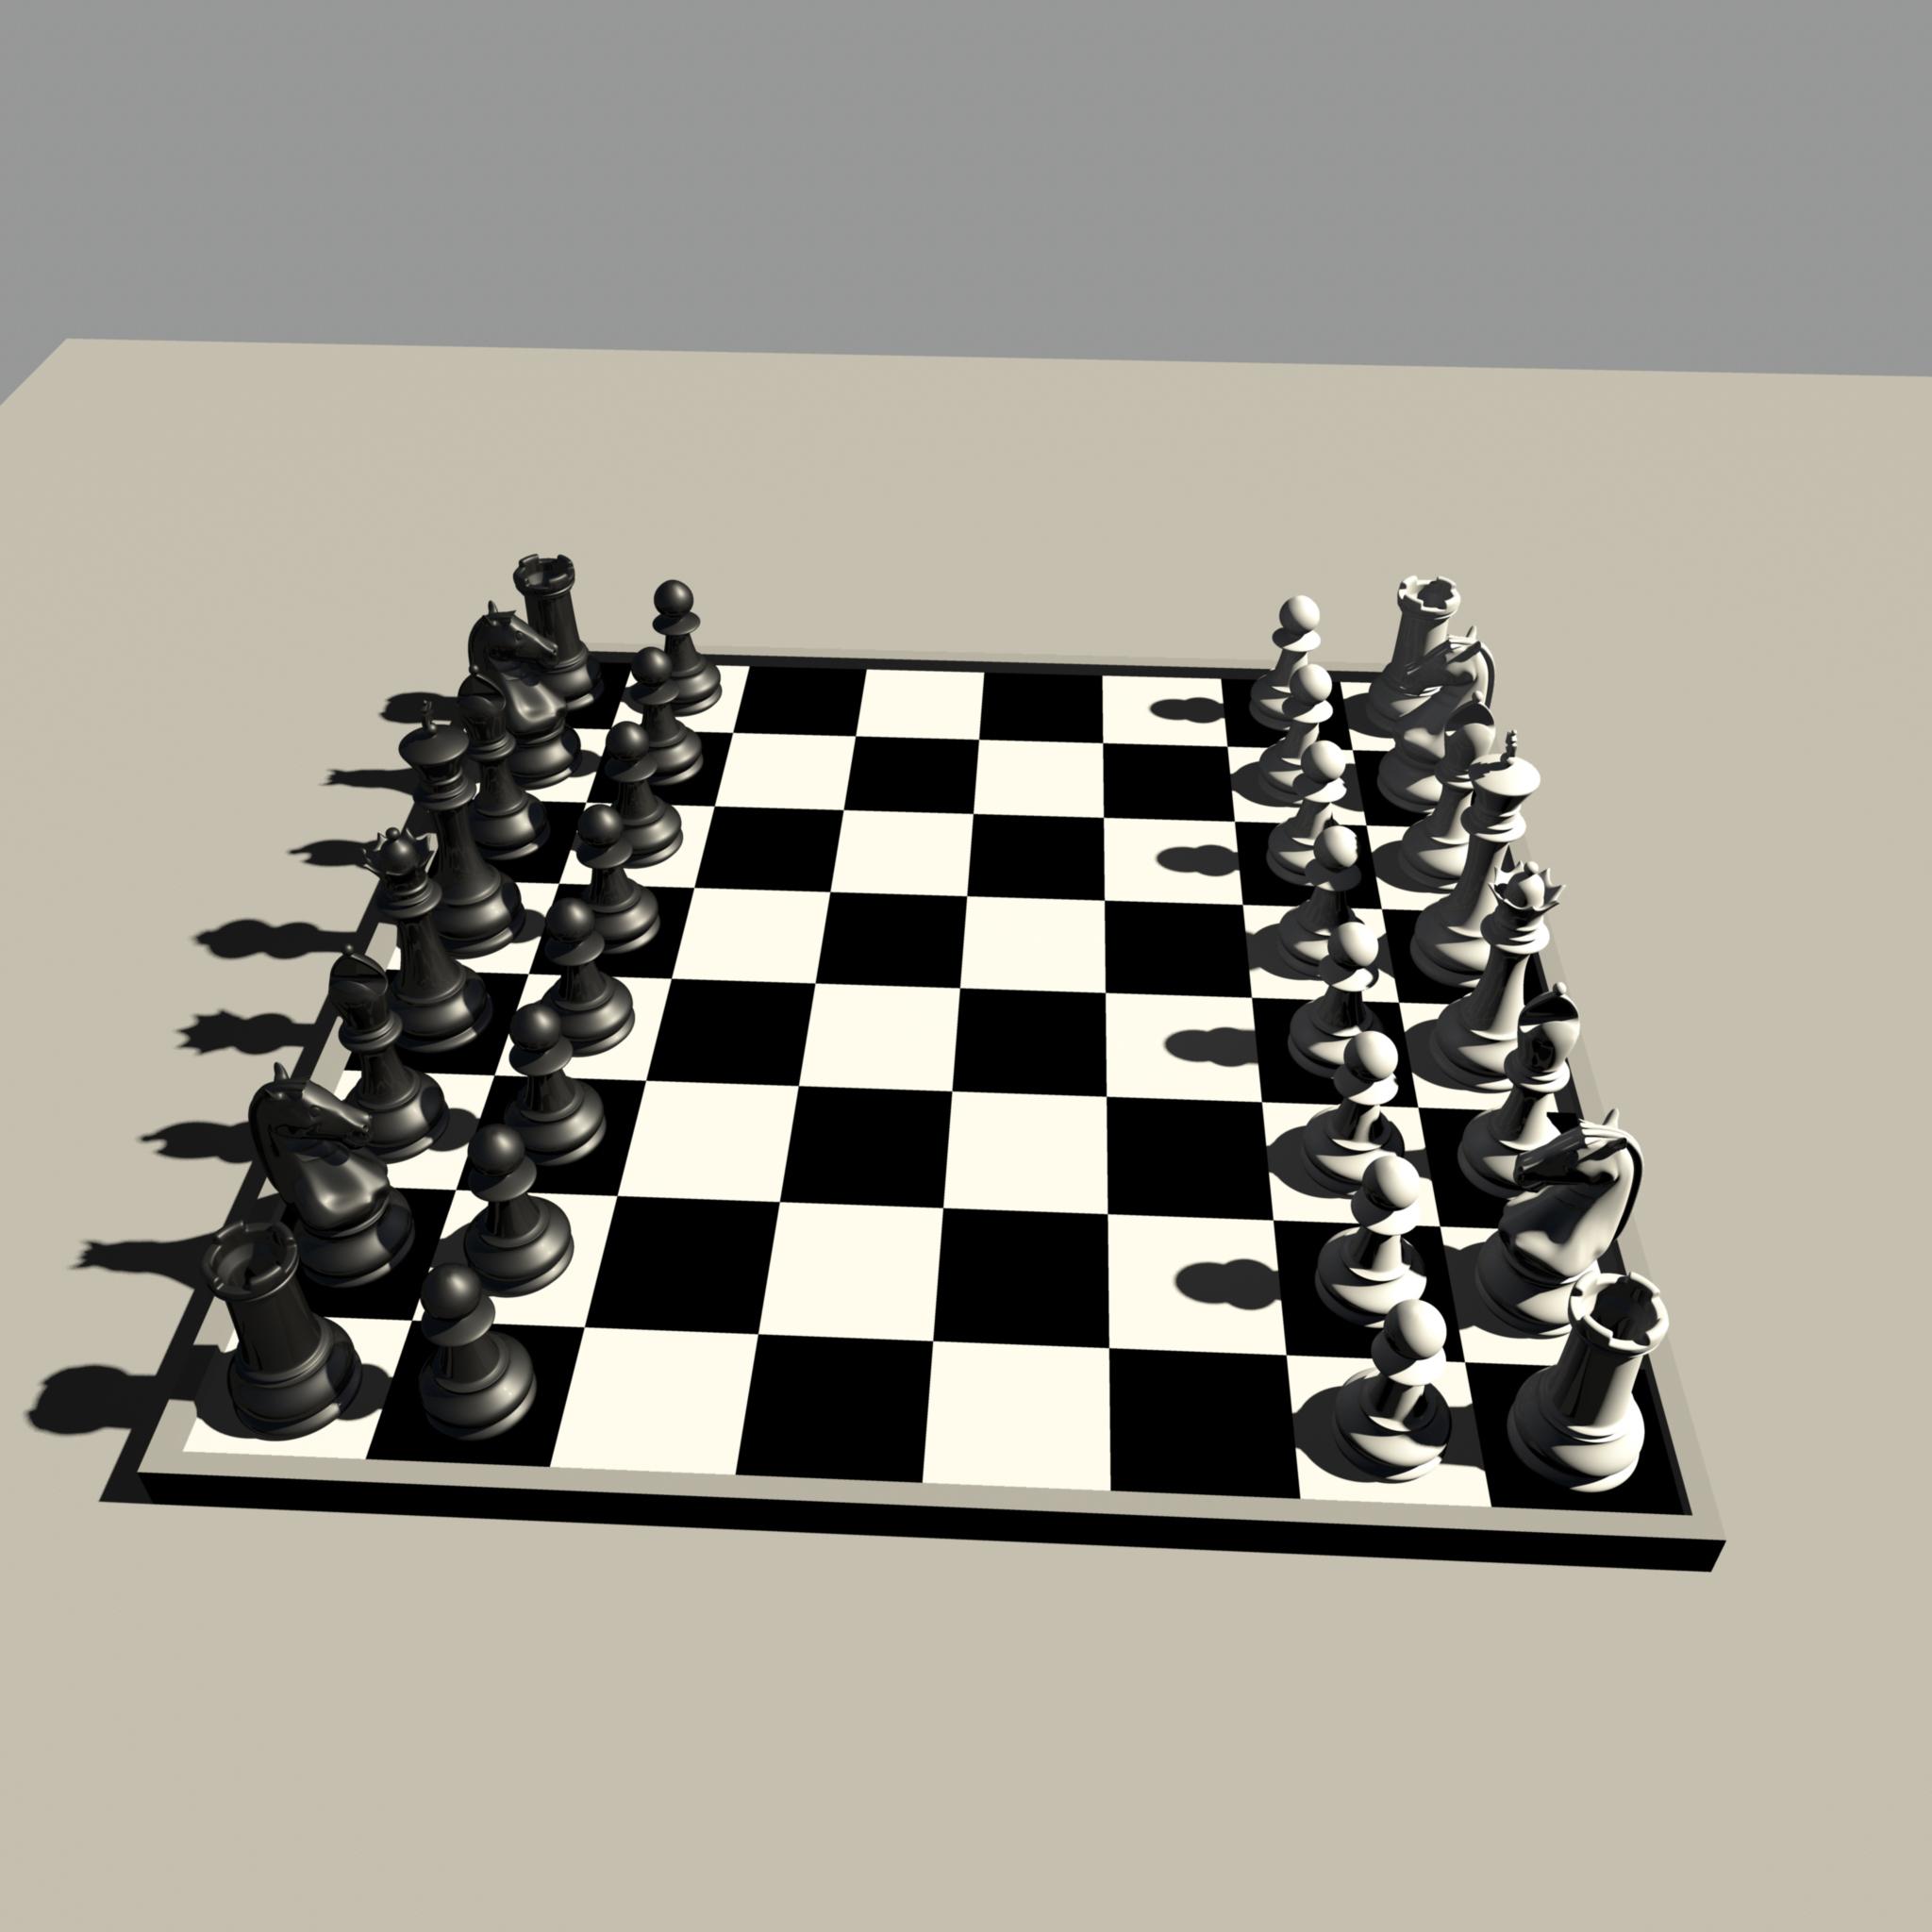 chess 3 3d model fbx ma mb obj 153548